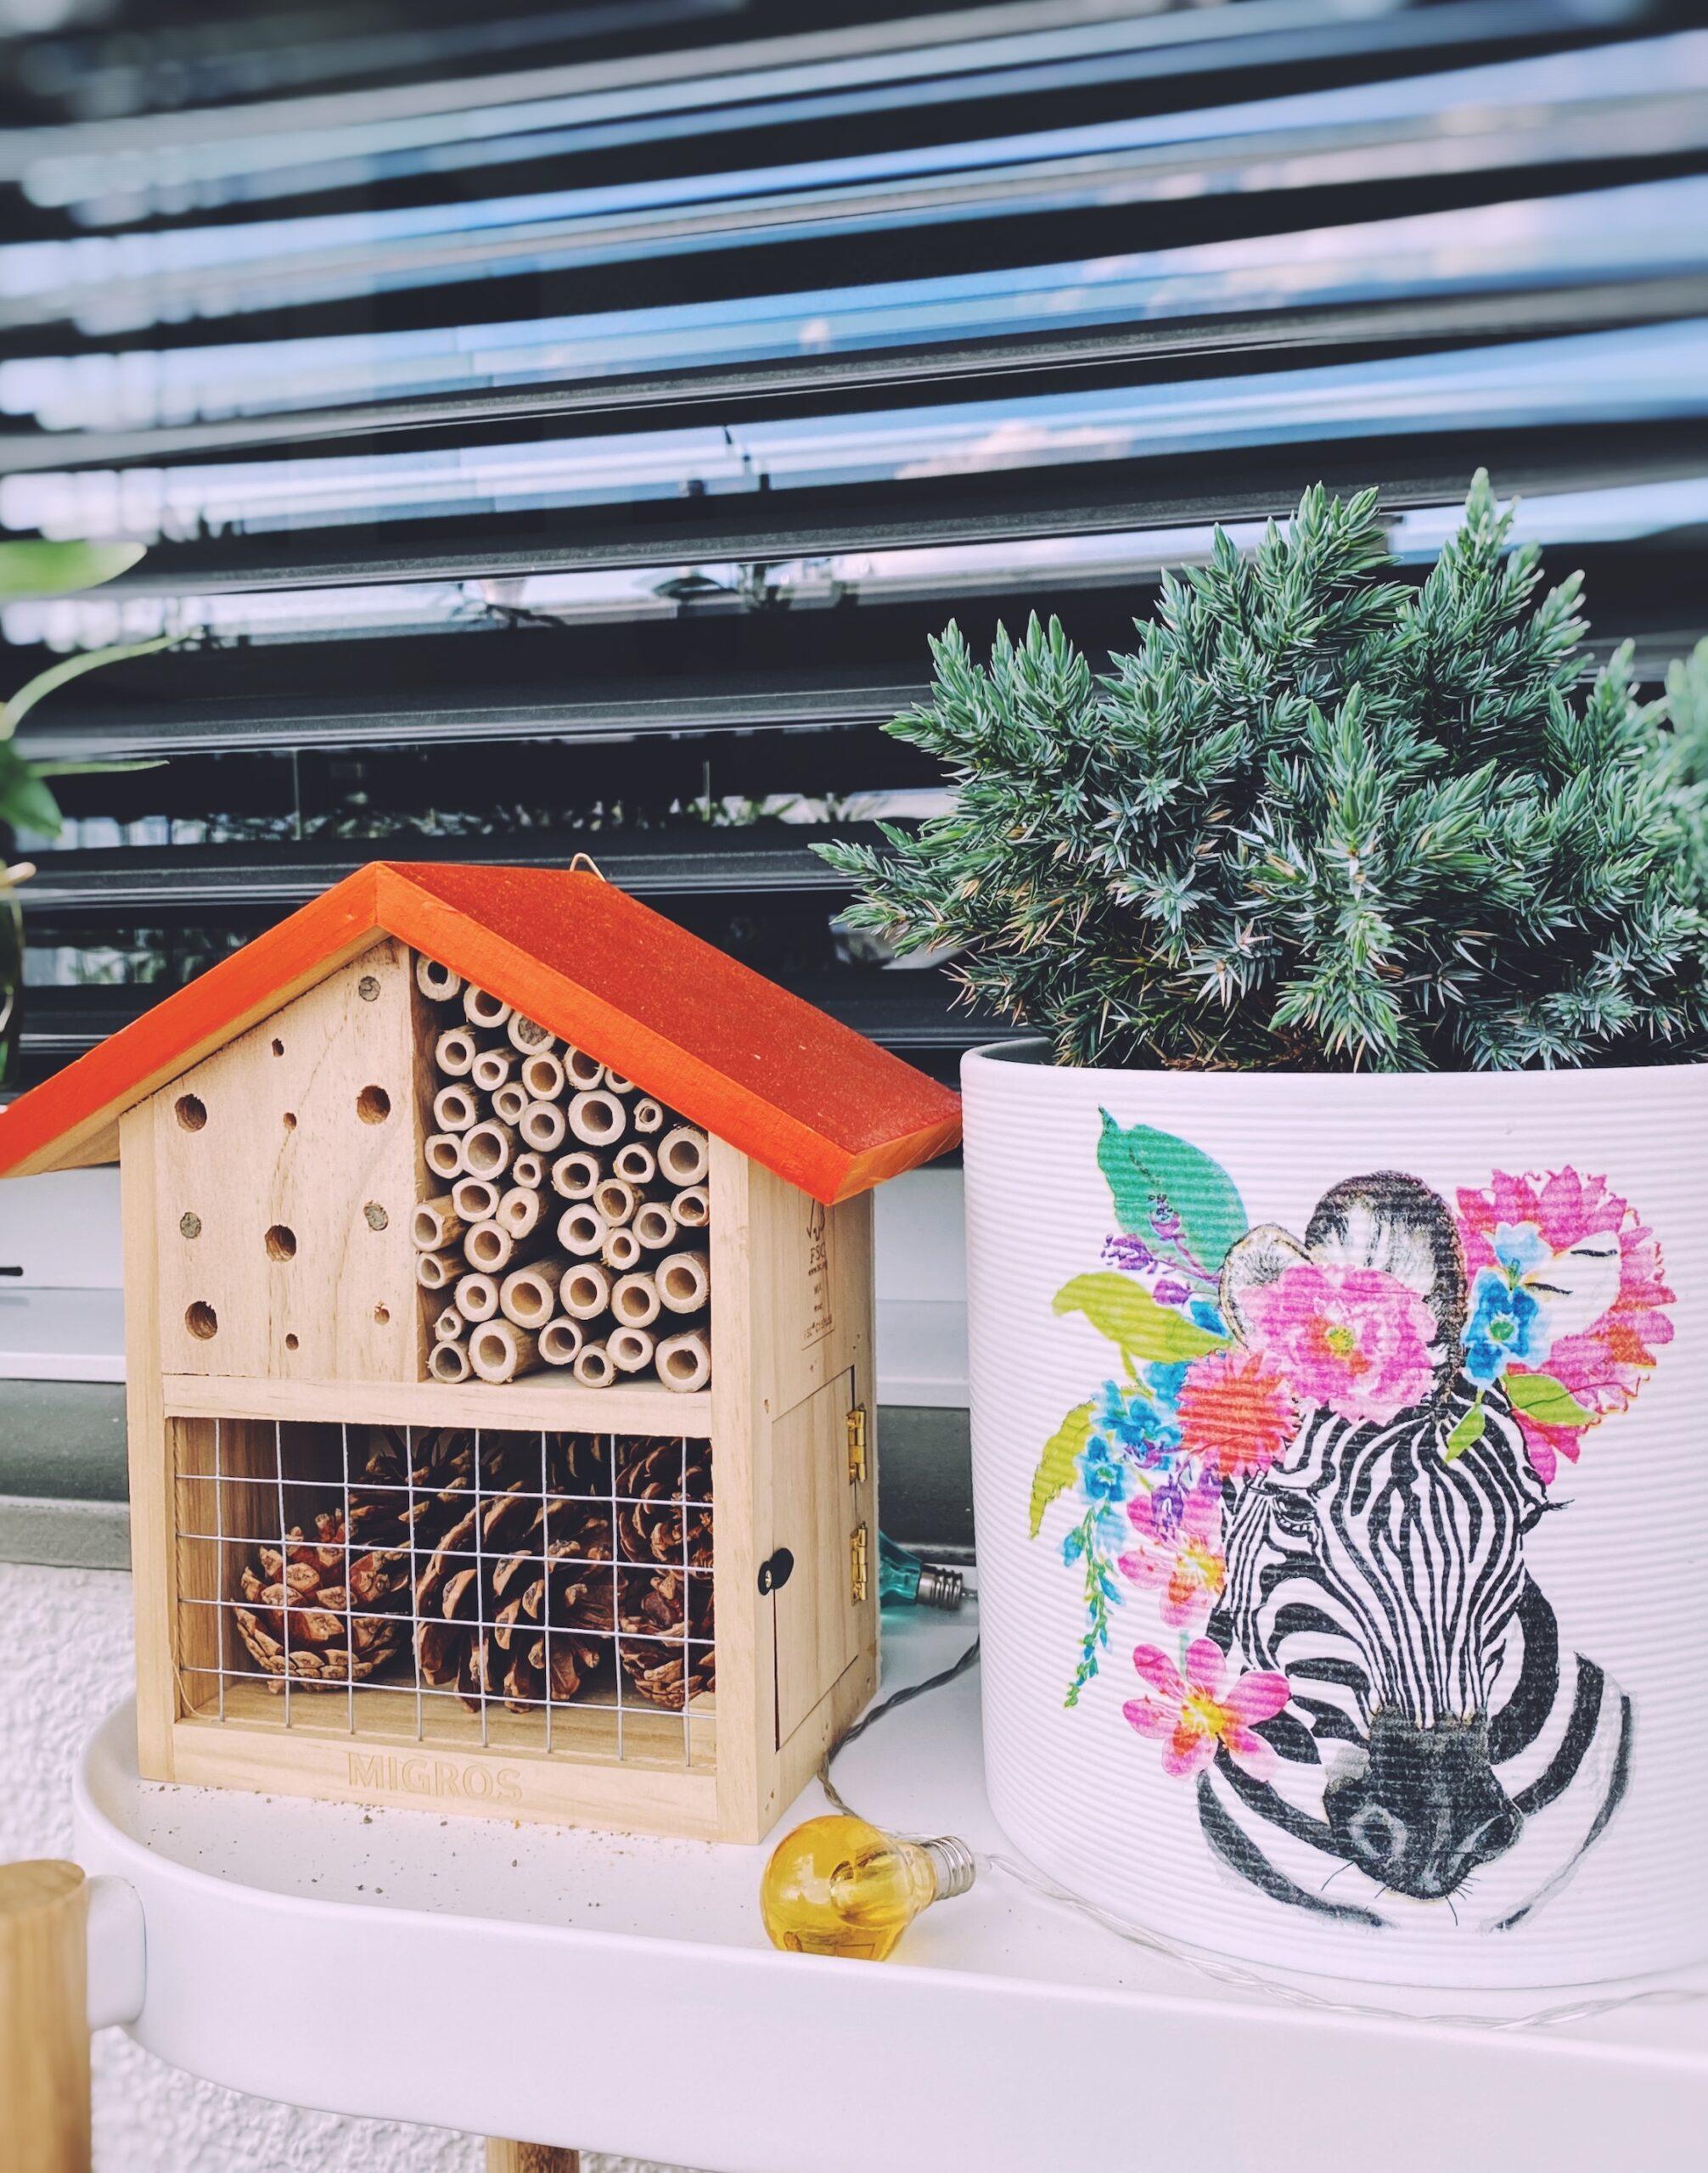 Bee hotel in the urban garden